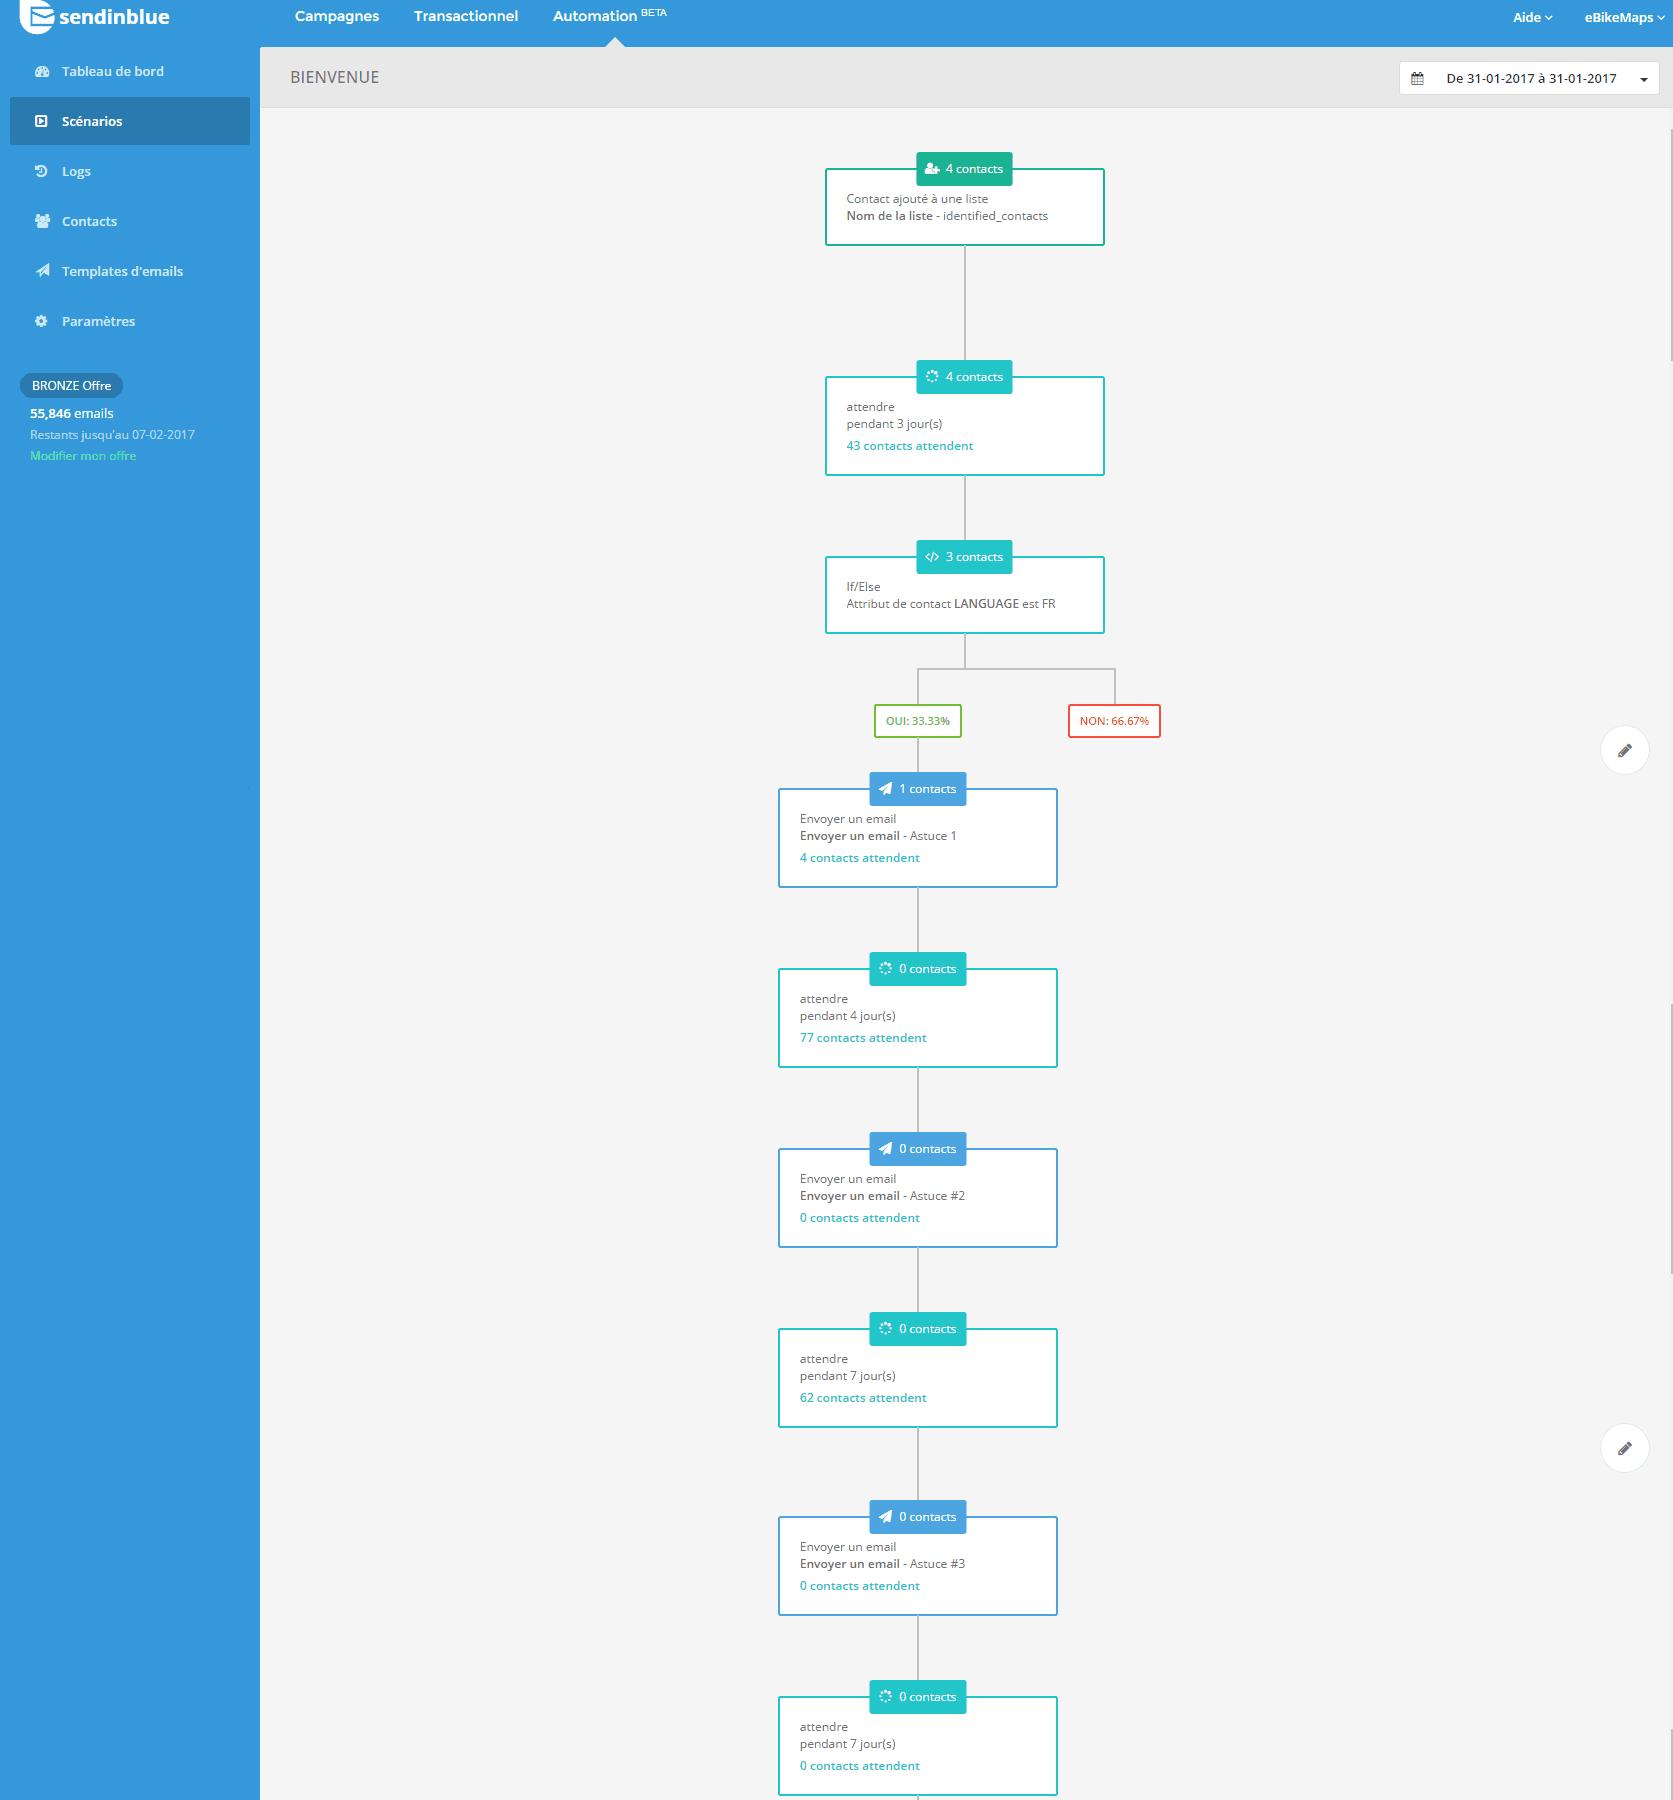 ebikemaps scenario automation